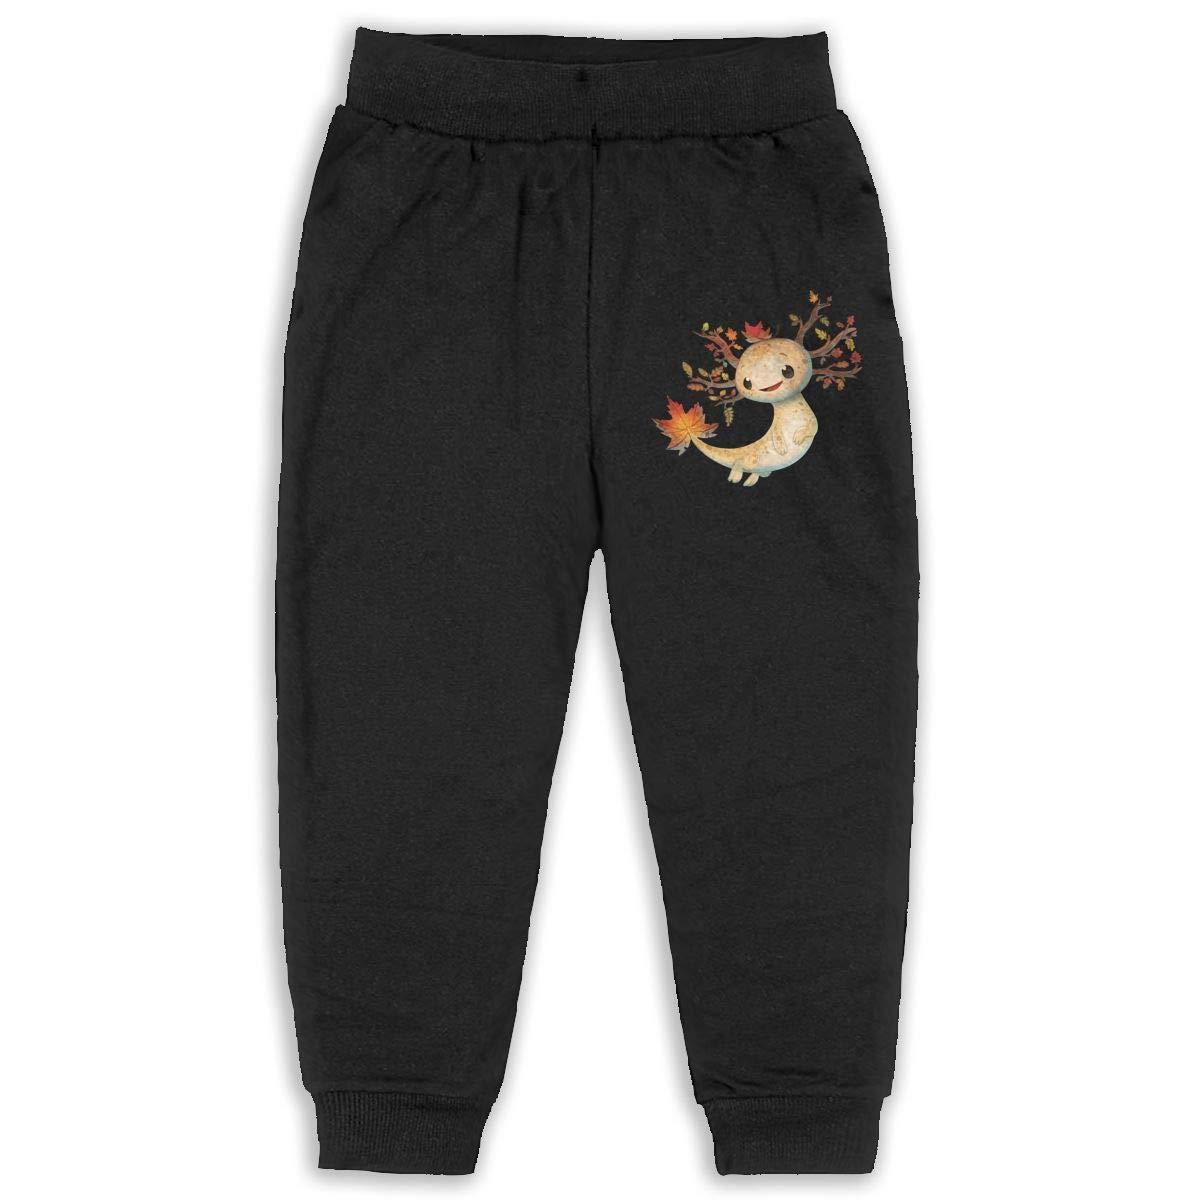 JOAPNWJ Dryad Children Cartoon Cotton Sweatpants Sport Jogger Elastic Pants